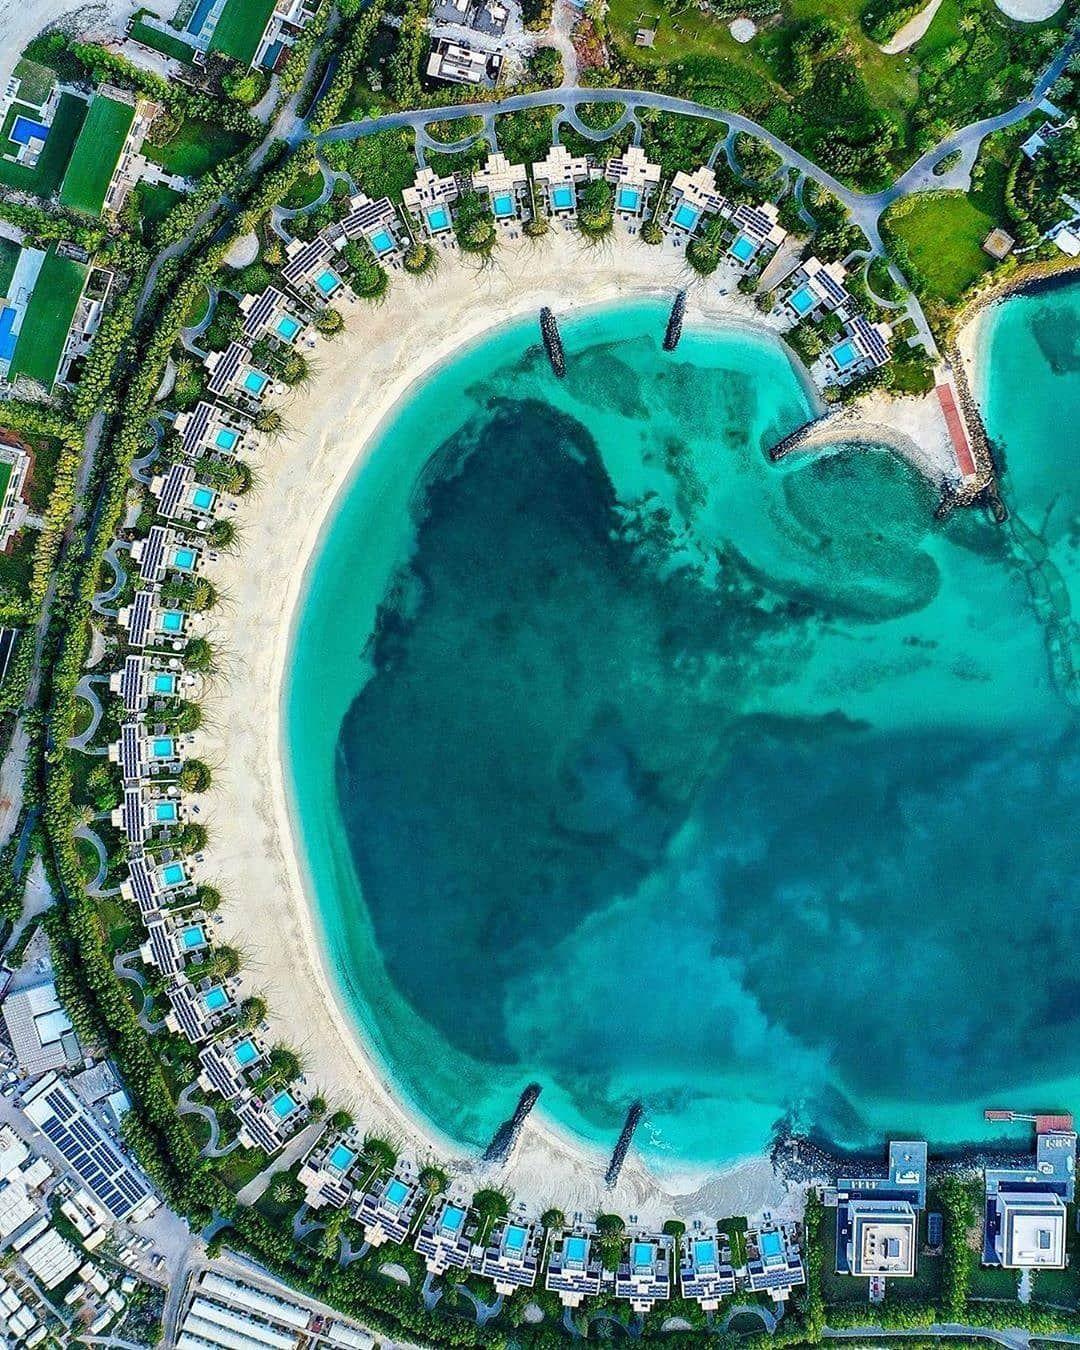 Zaya Nurai Island Abu Dhabi Uae Zayanuraiisland Abudhabi Visitabudhabi Uae Travelgoals Travel Traveldiaries Island Resort Abu Dhabi Tourism